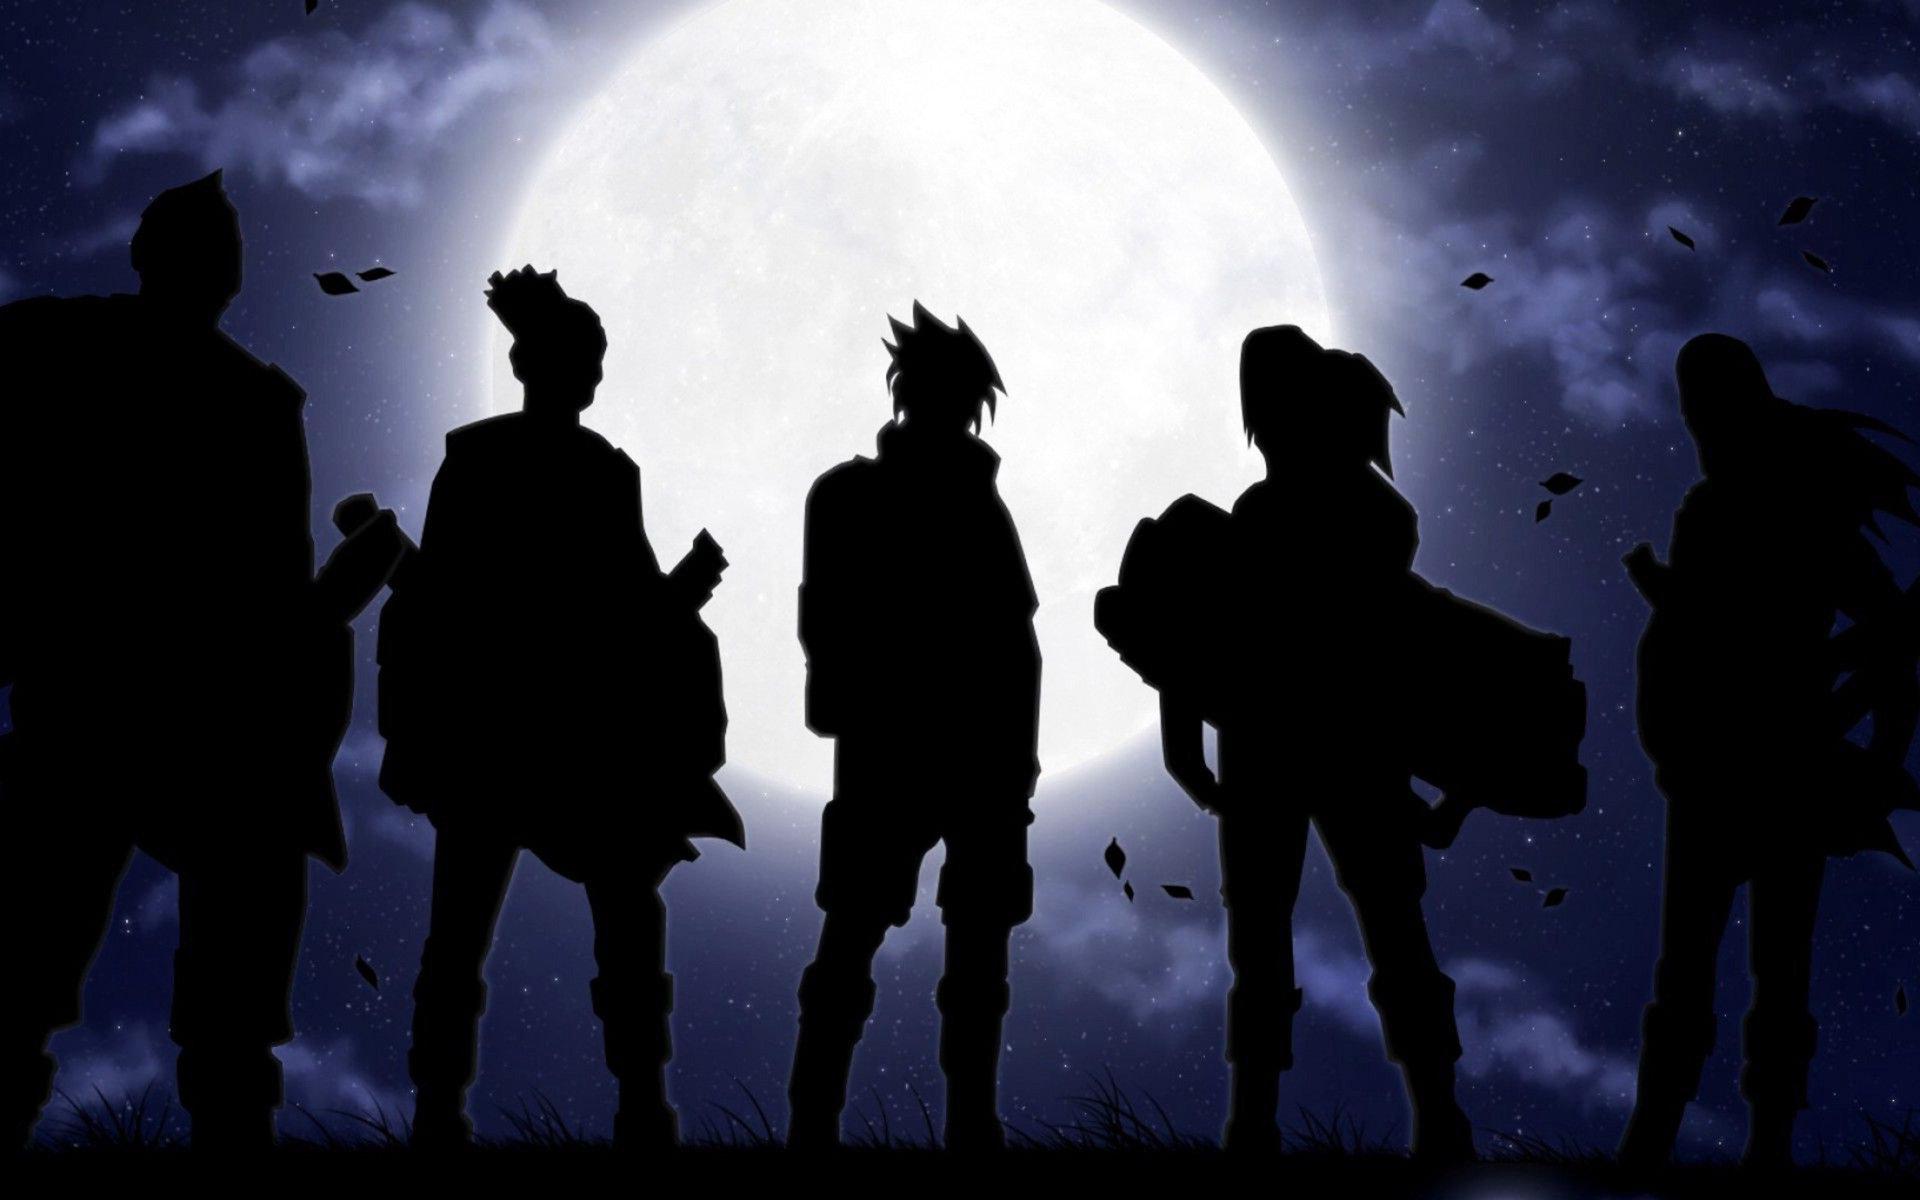 Hd wallpaper anime - Best Anime Wallpaper Background Hd Quality Hd Anime Wallpaper